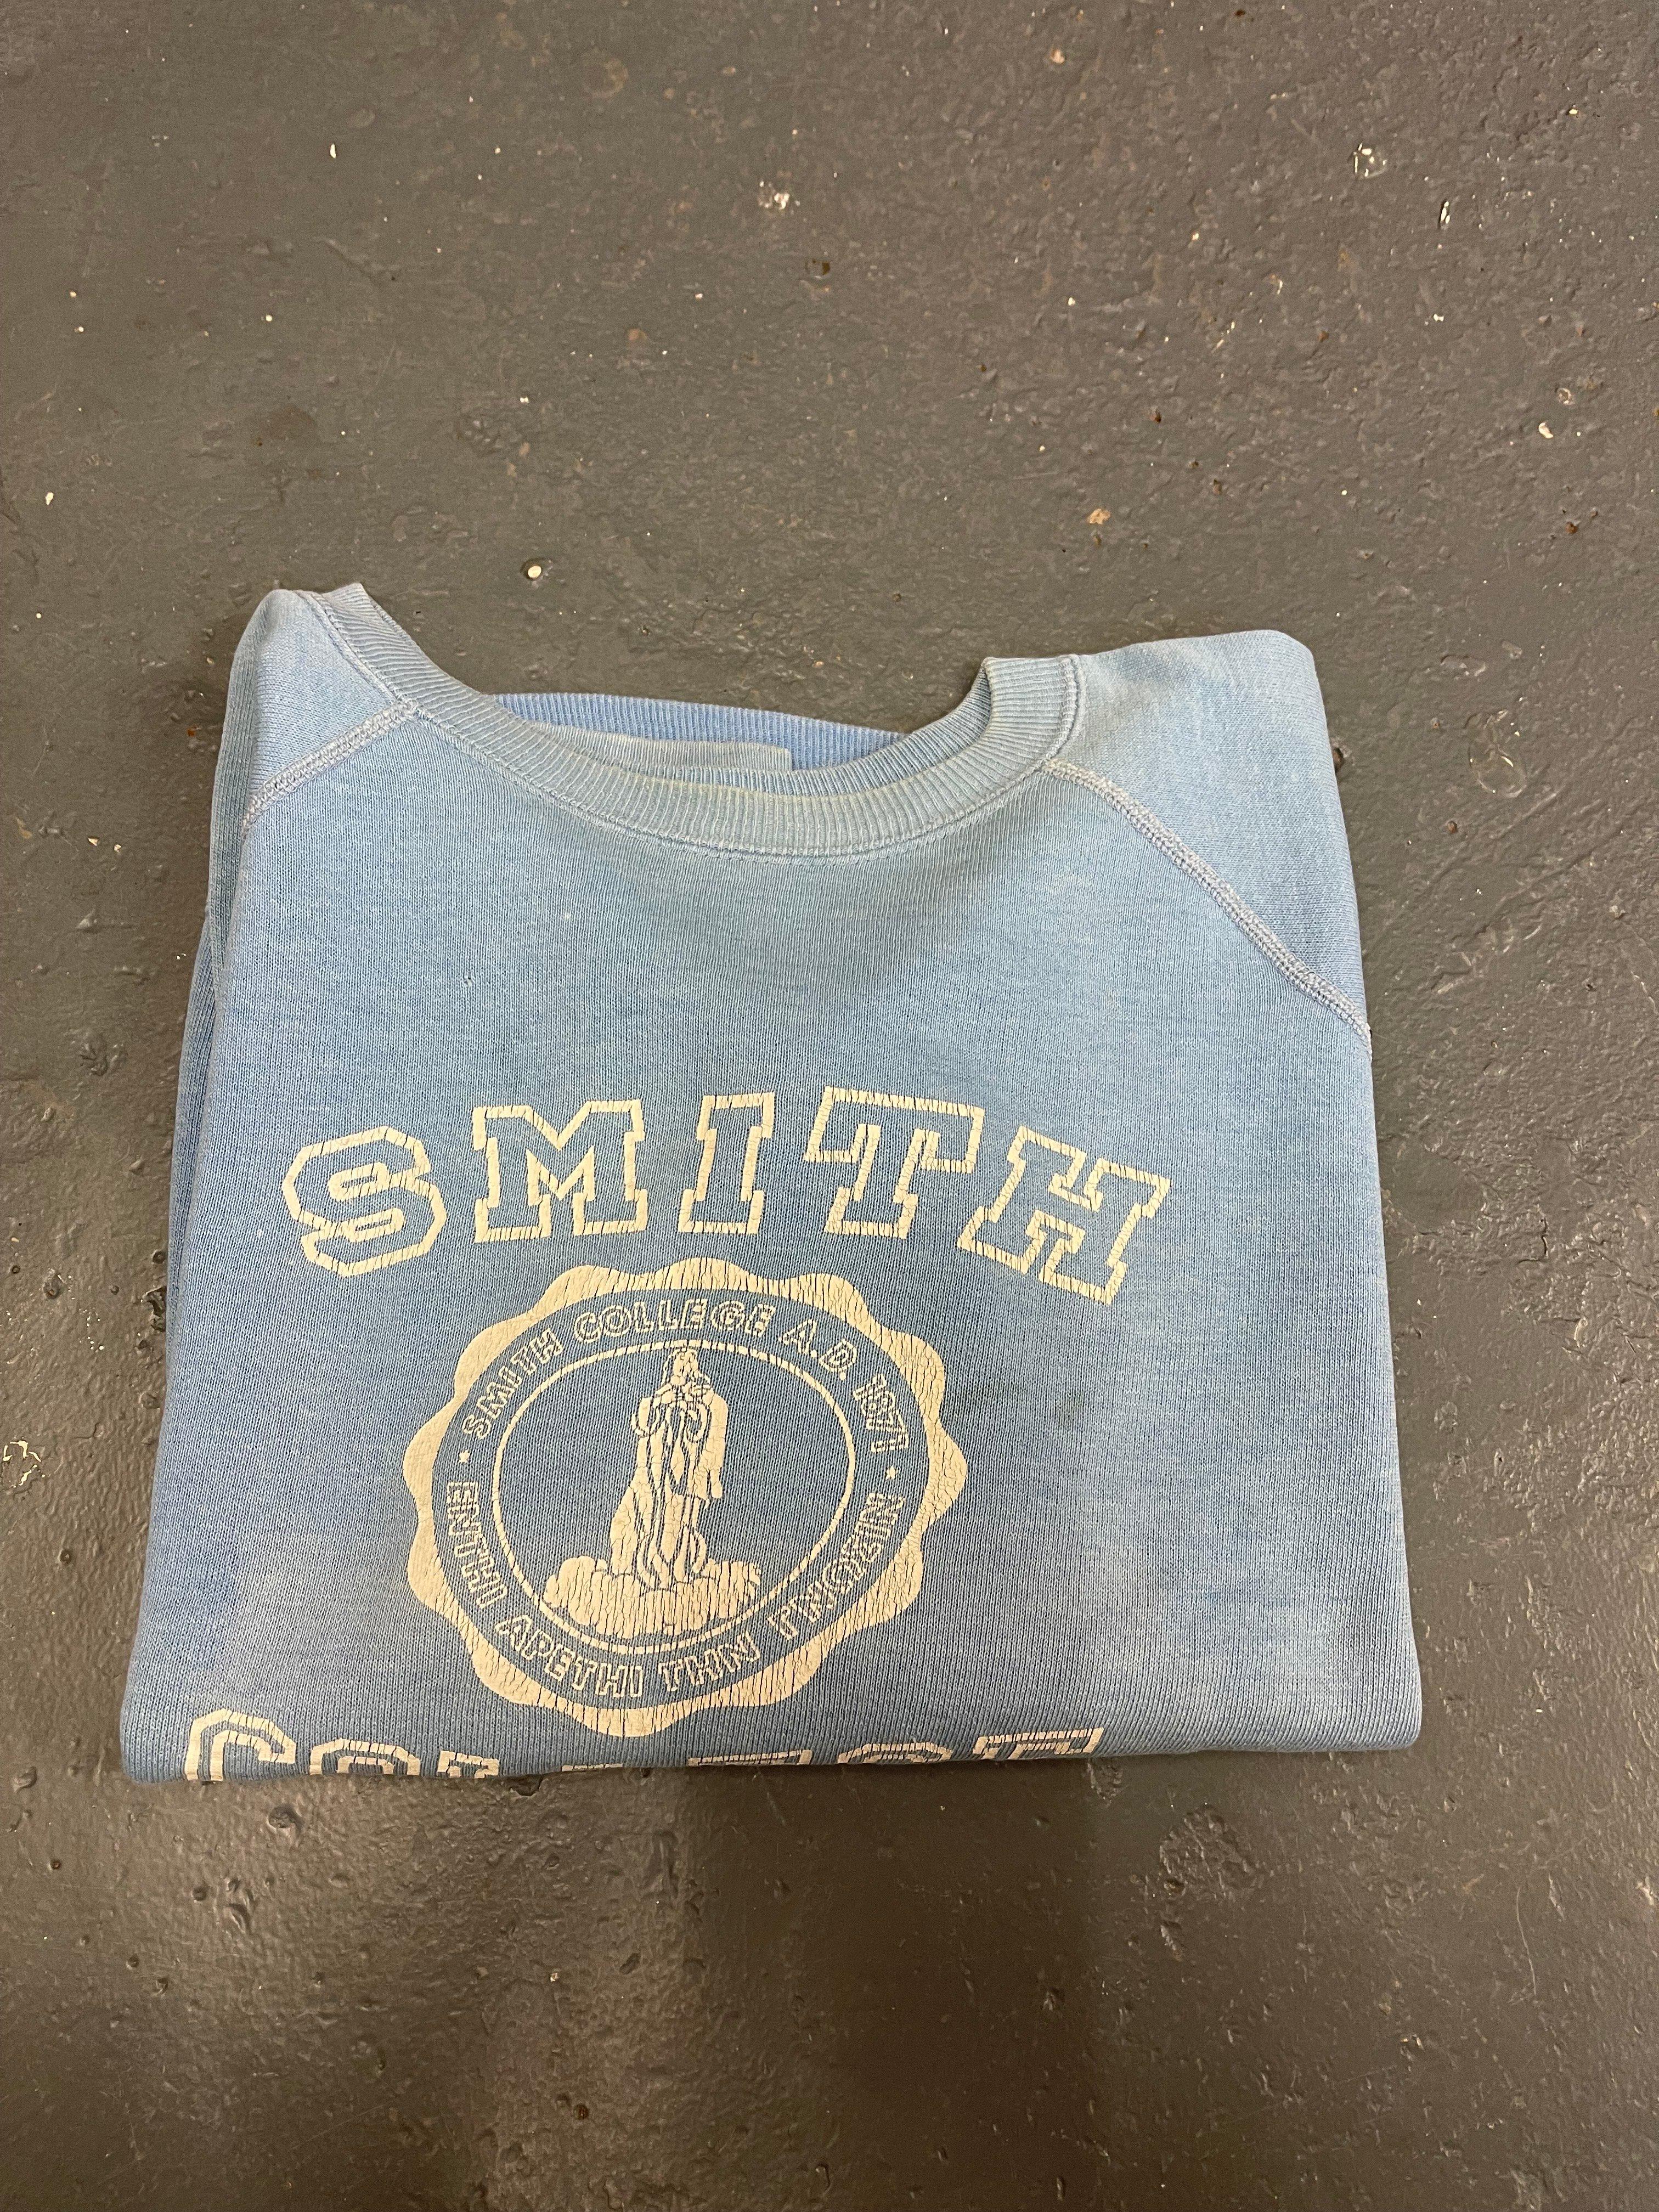 Image of 60s sun faded SMITH COLLEGE sweatshirt